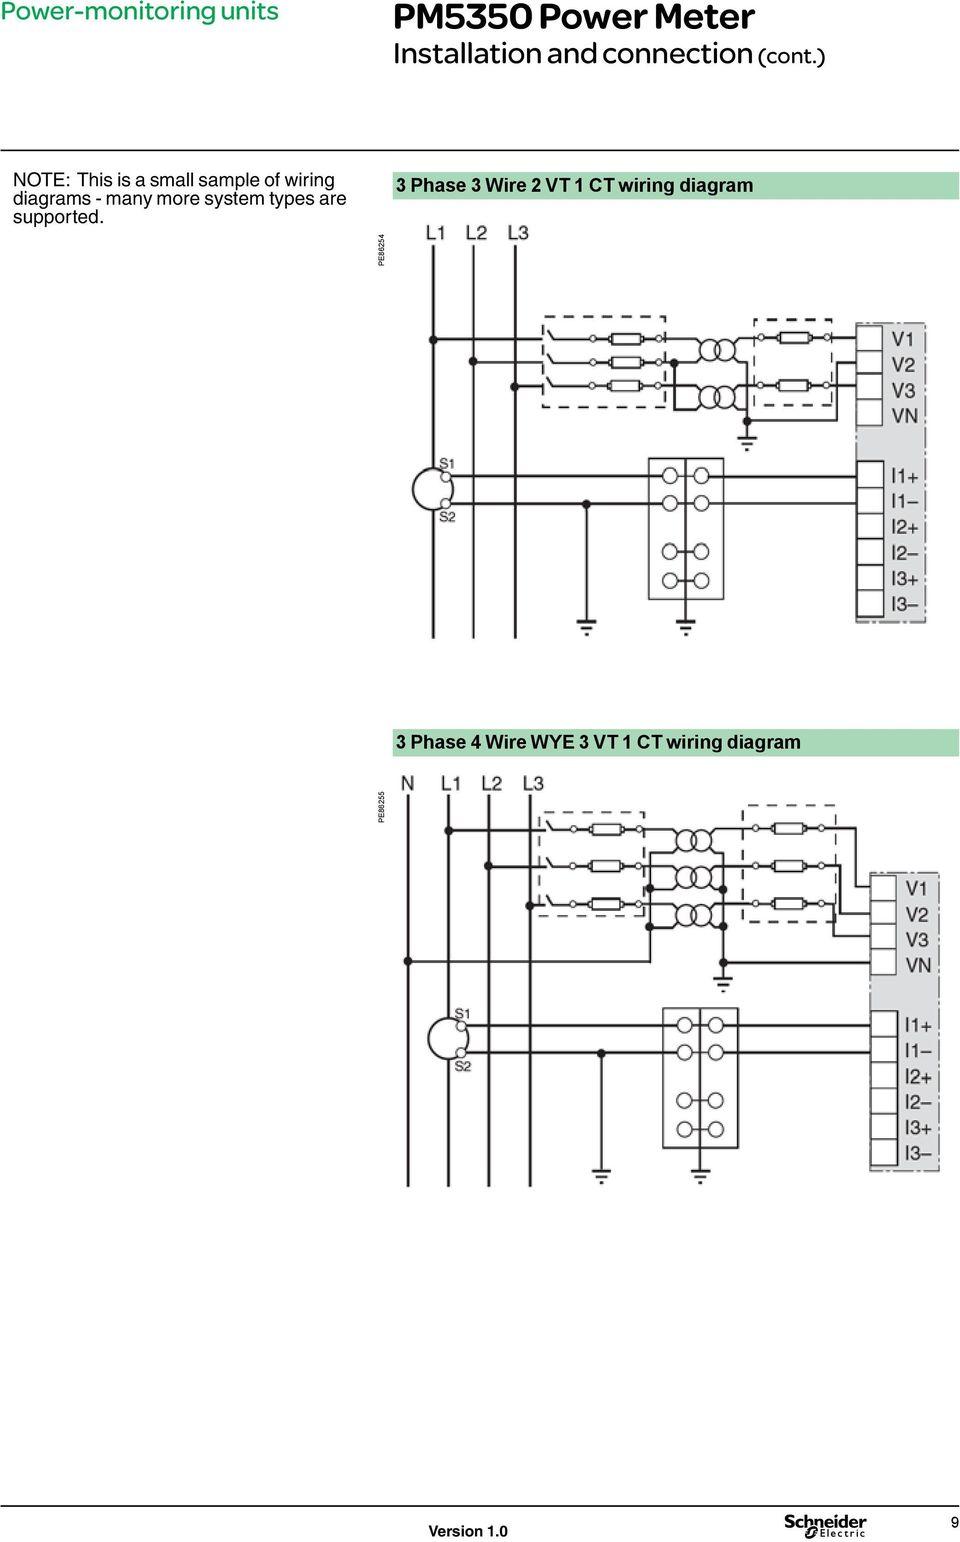 medium resolution of wye vt wiring diagram wiring diagrams wni wye vt wiring diagram